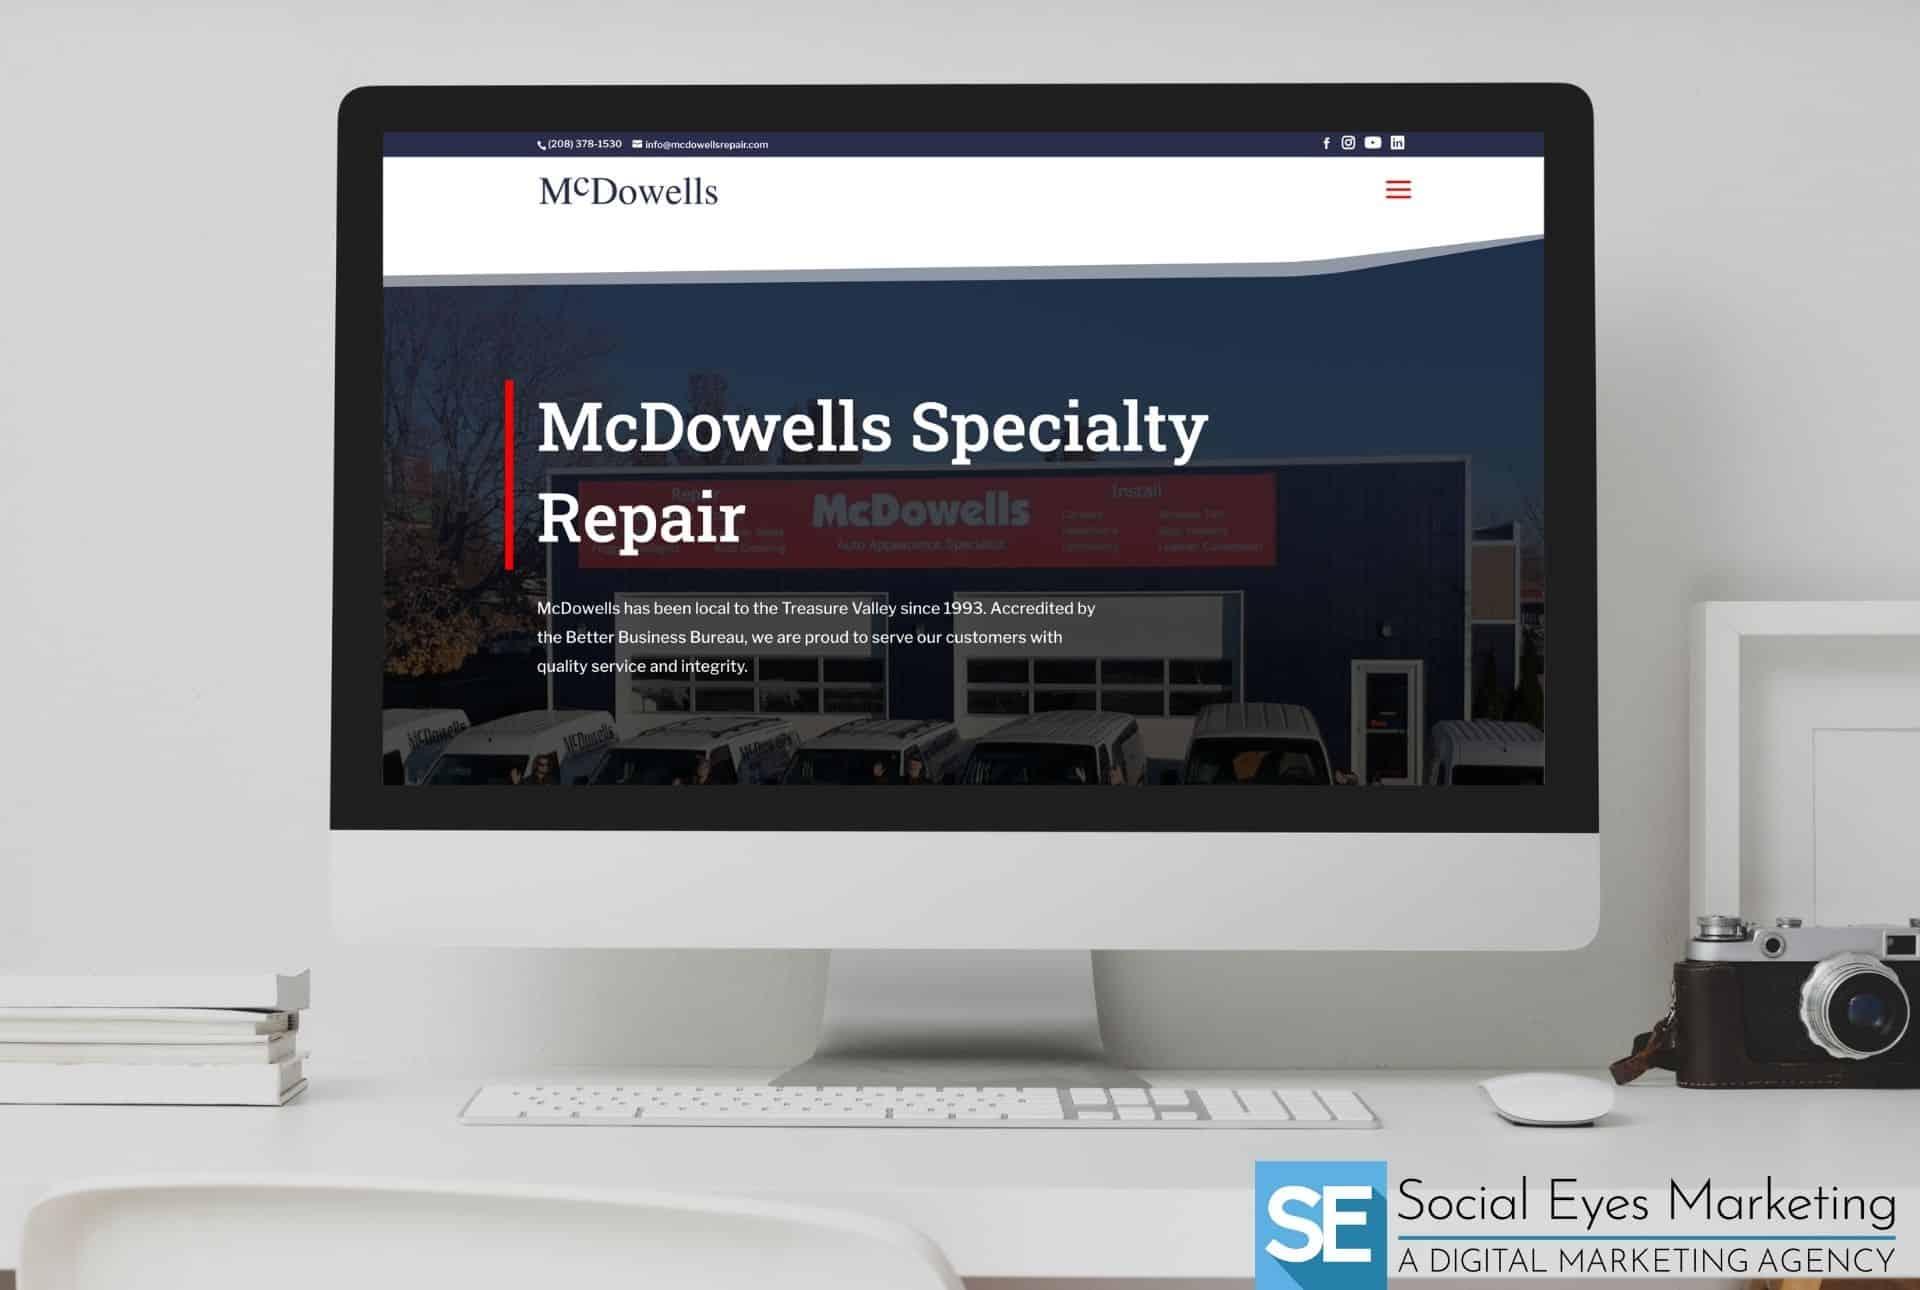 Case Study Spotlight: McDowells